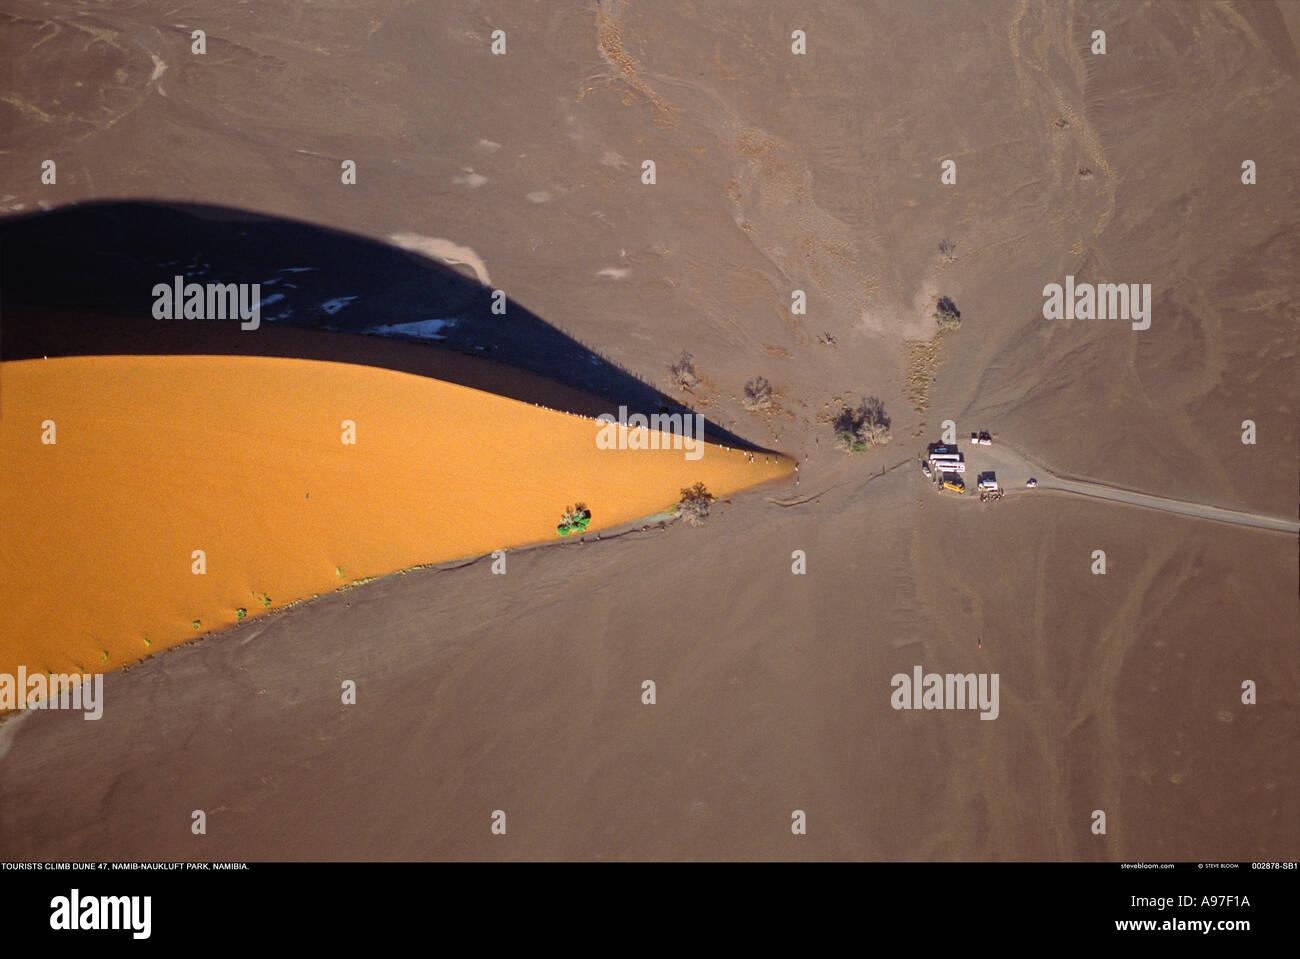 Tourists climb Dune 47 Namib Nauklift Park Namibia - Stock Image